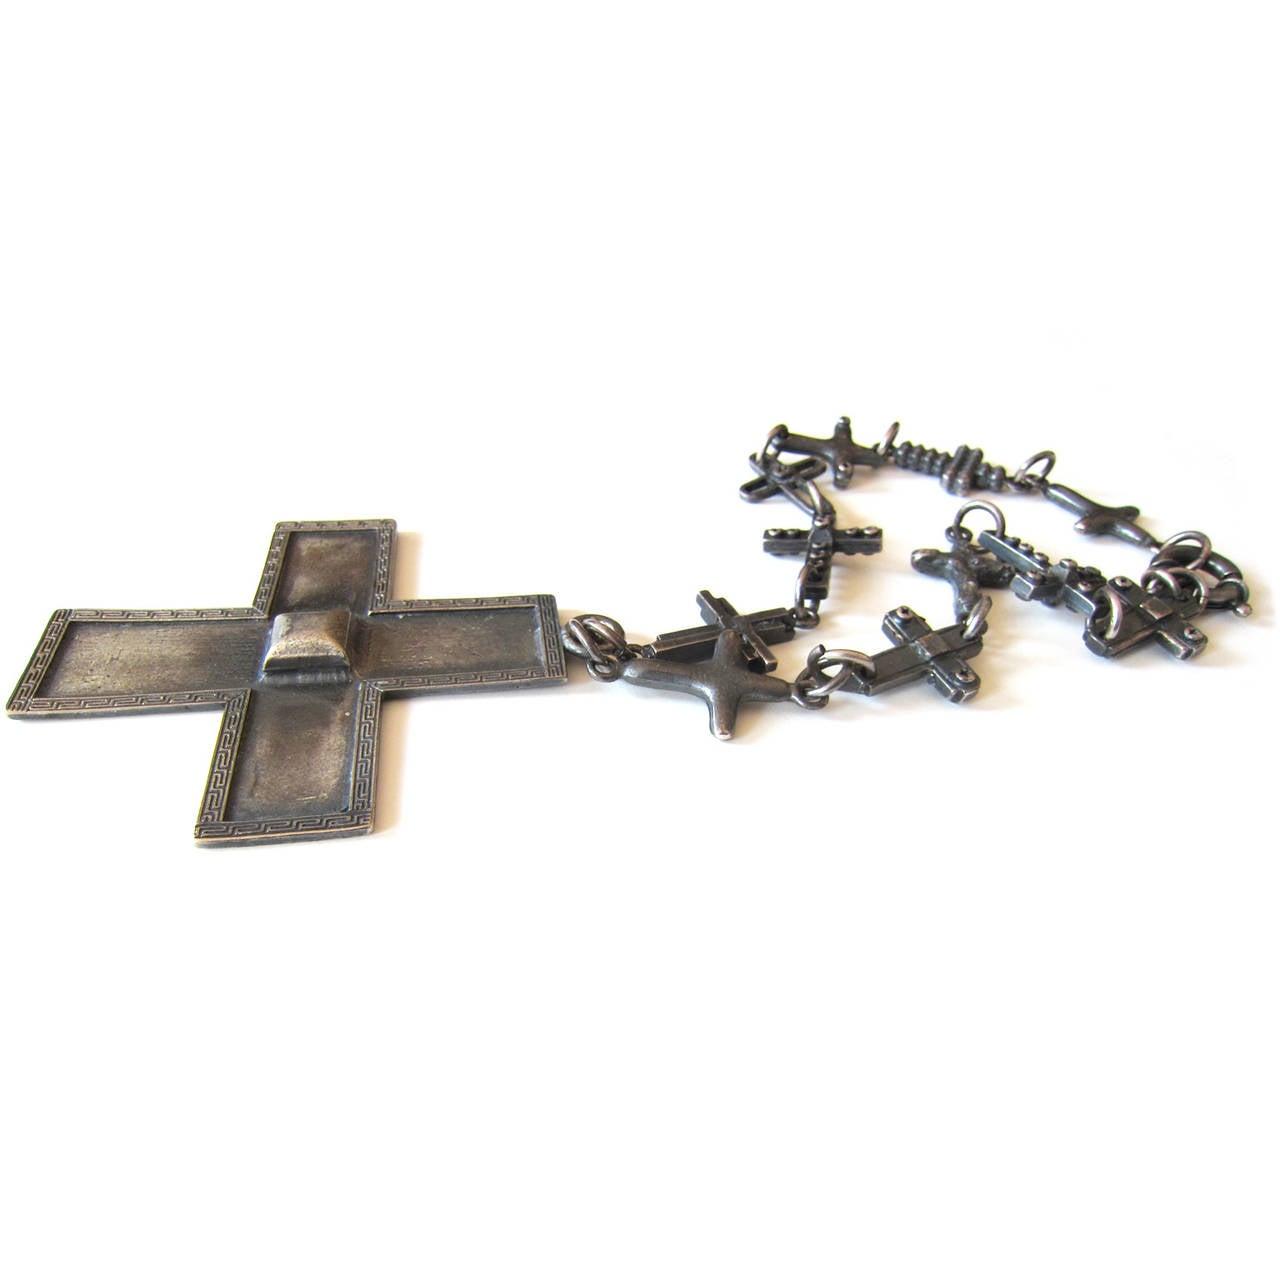 Gianni Versace Massive Cross Necklace 1990's 3